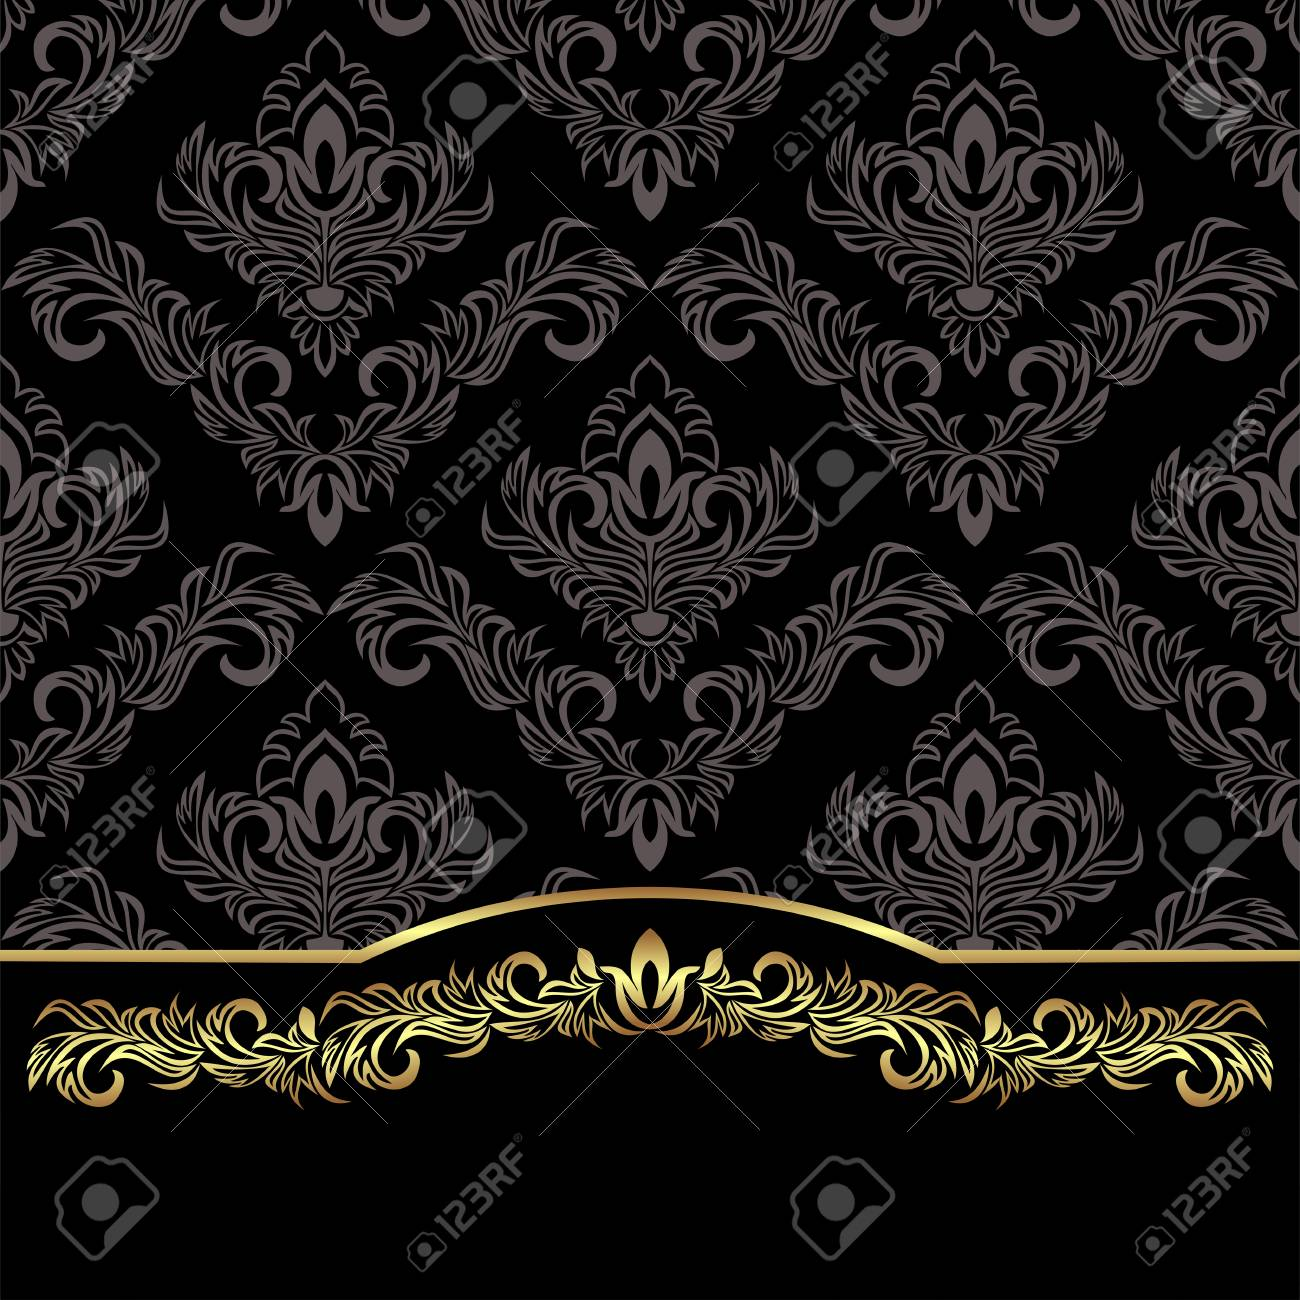 Luxury black damask Background decorated the golden floral Border - 97509699